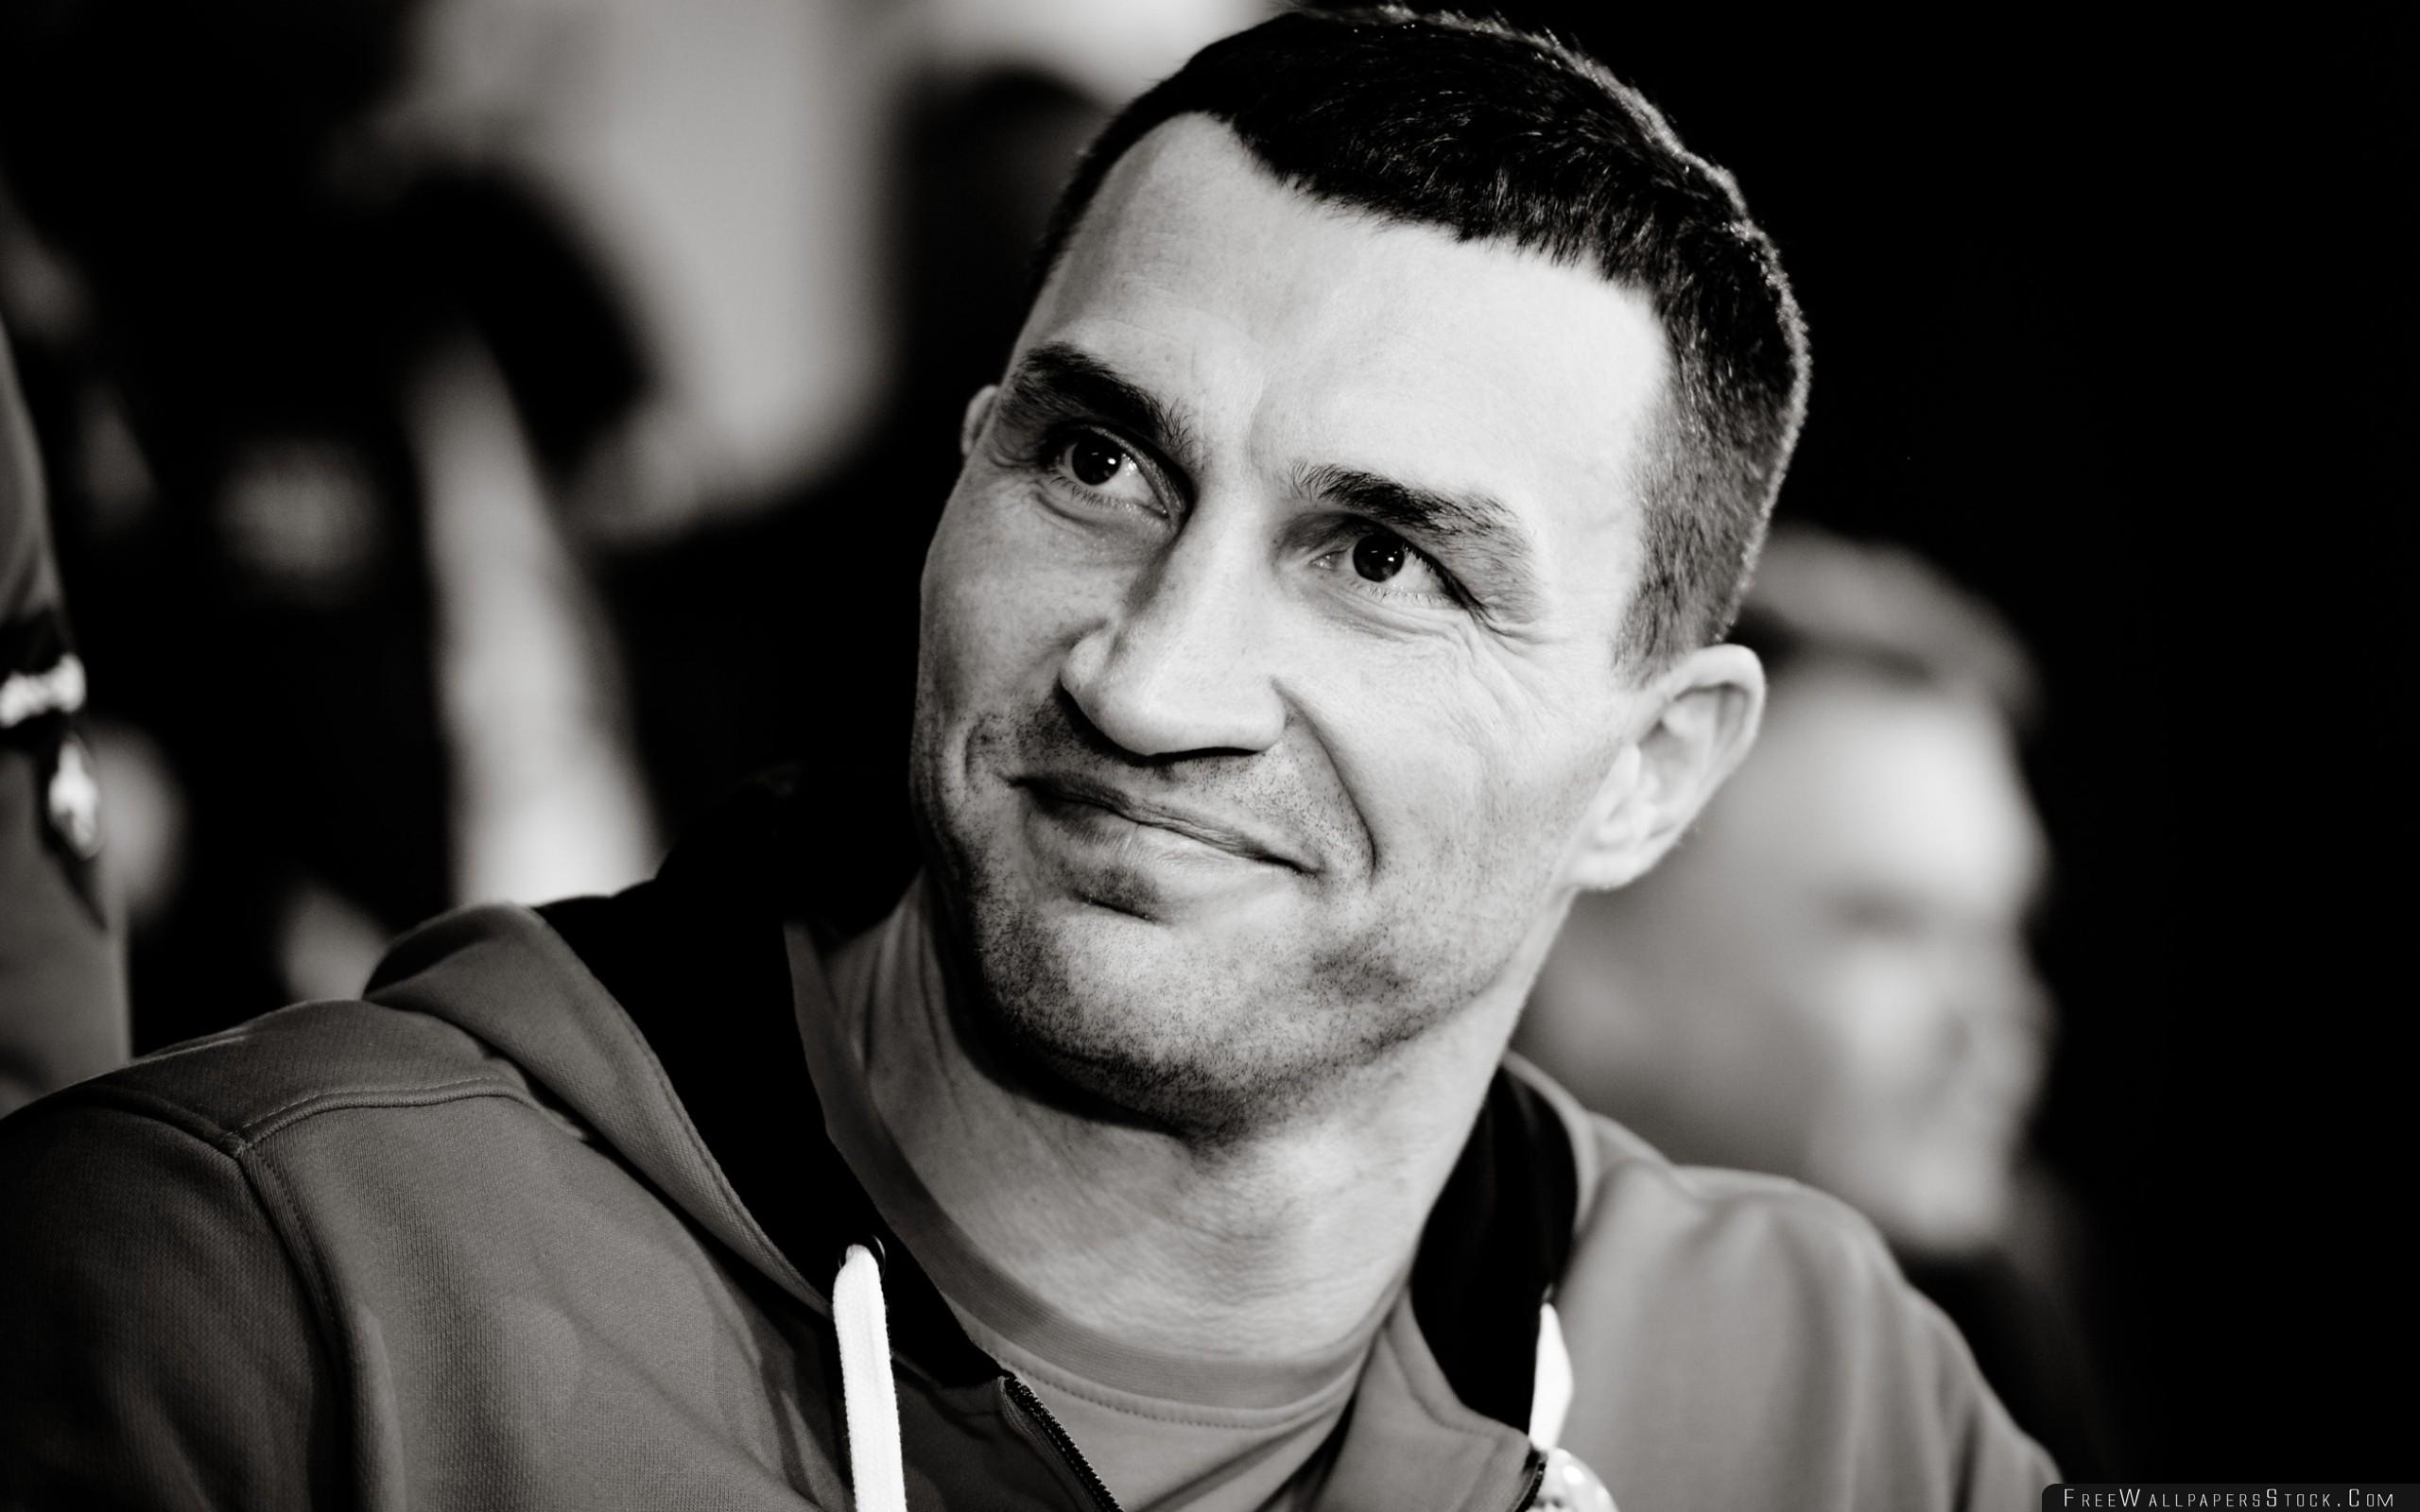 Download Free Wallpaper Wladimir Klitschko Boxer Smile Face Male